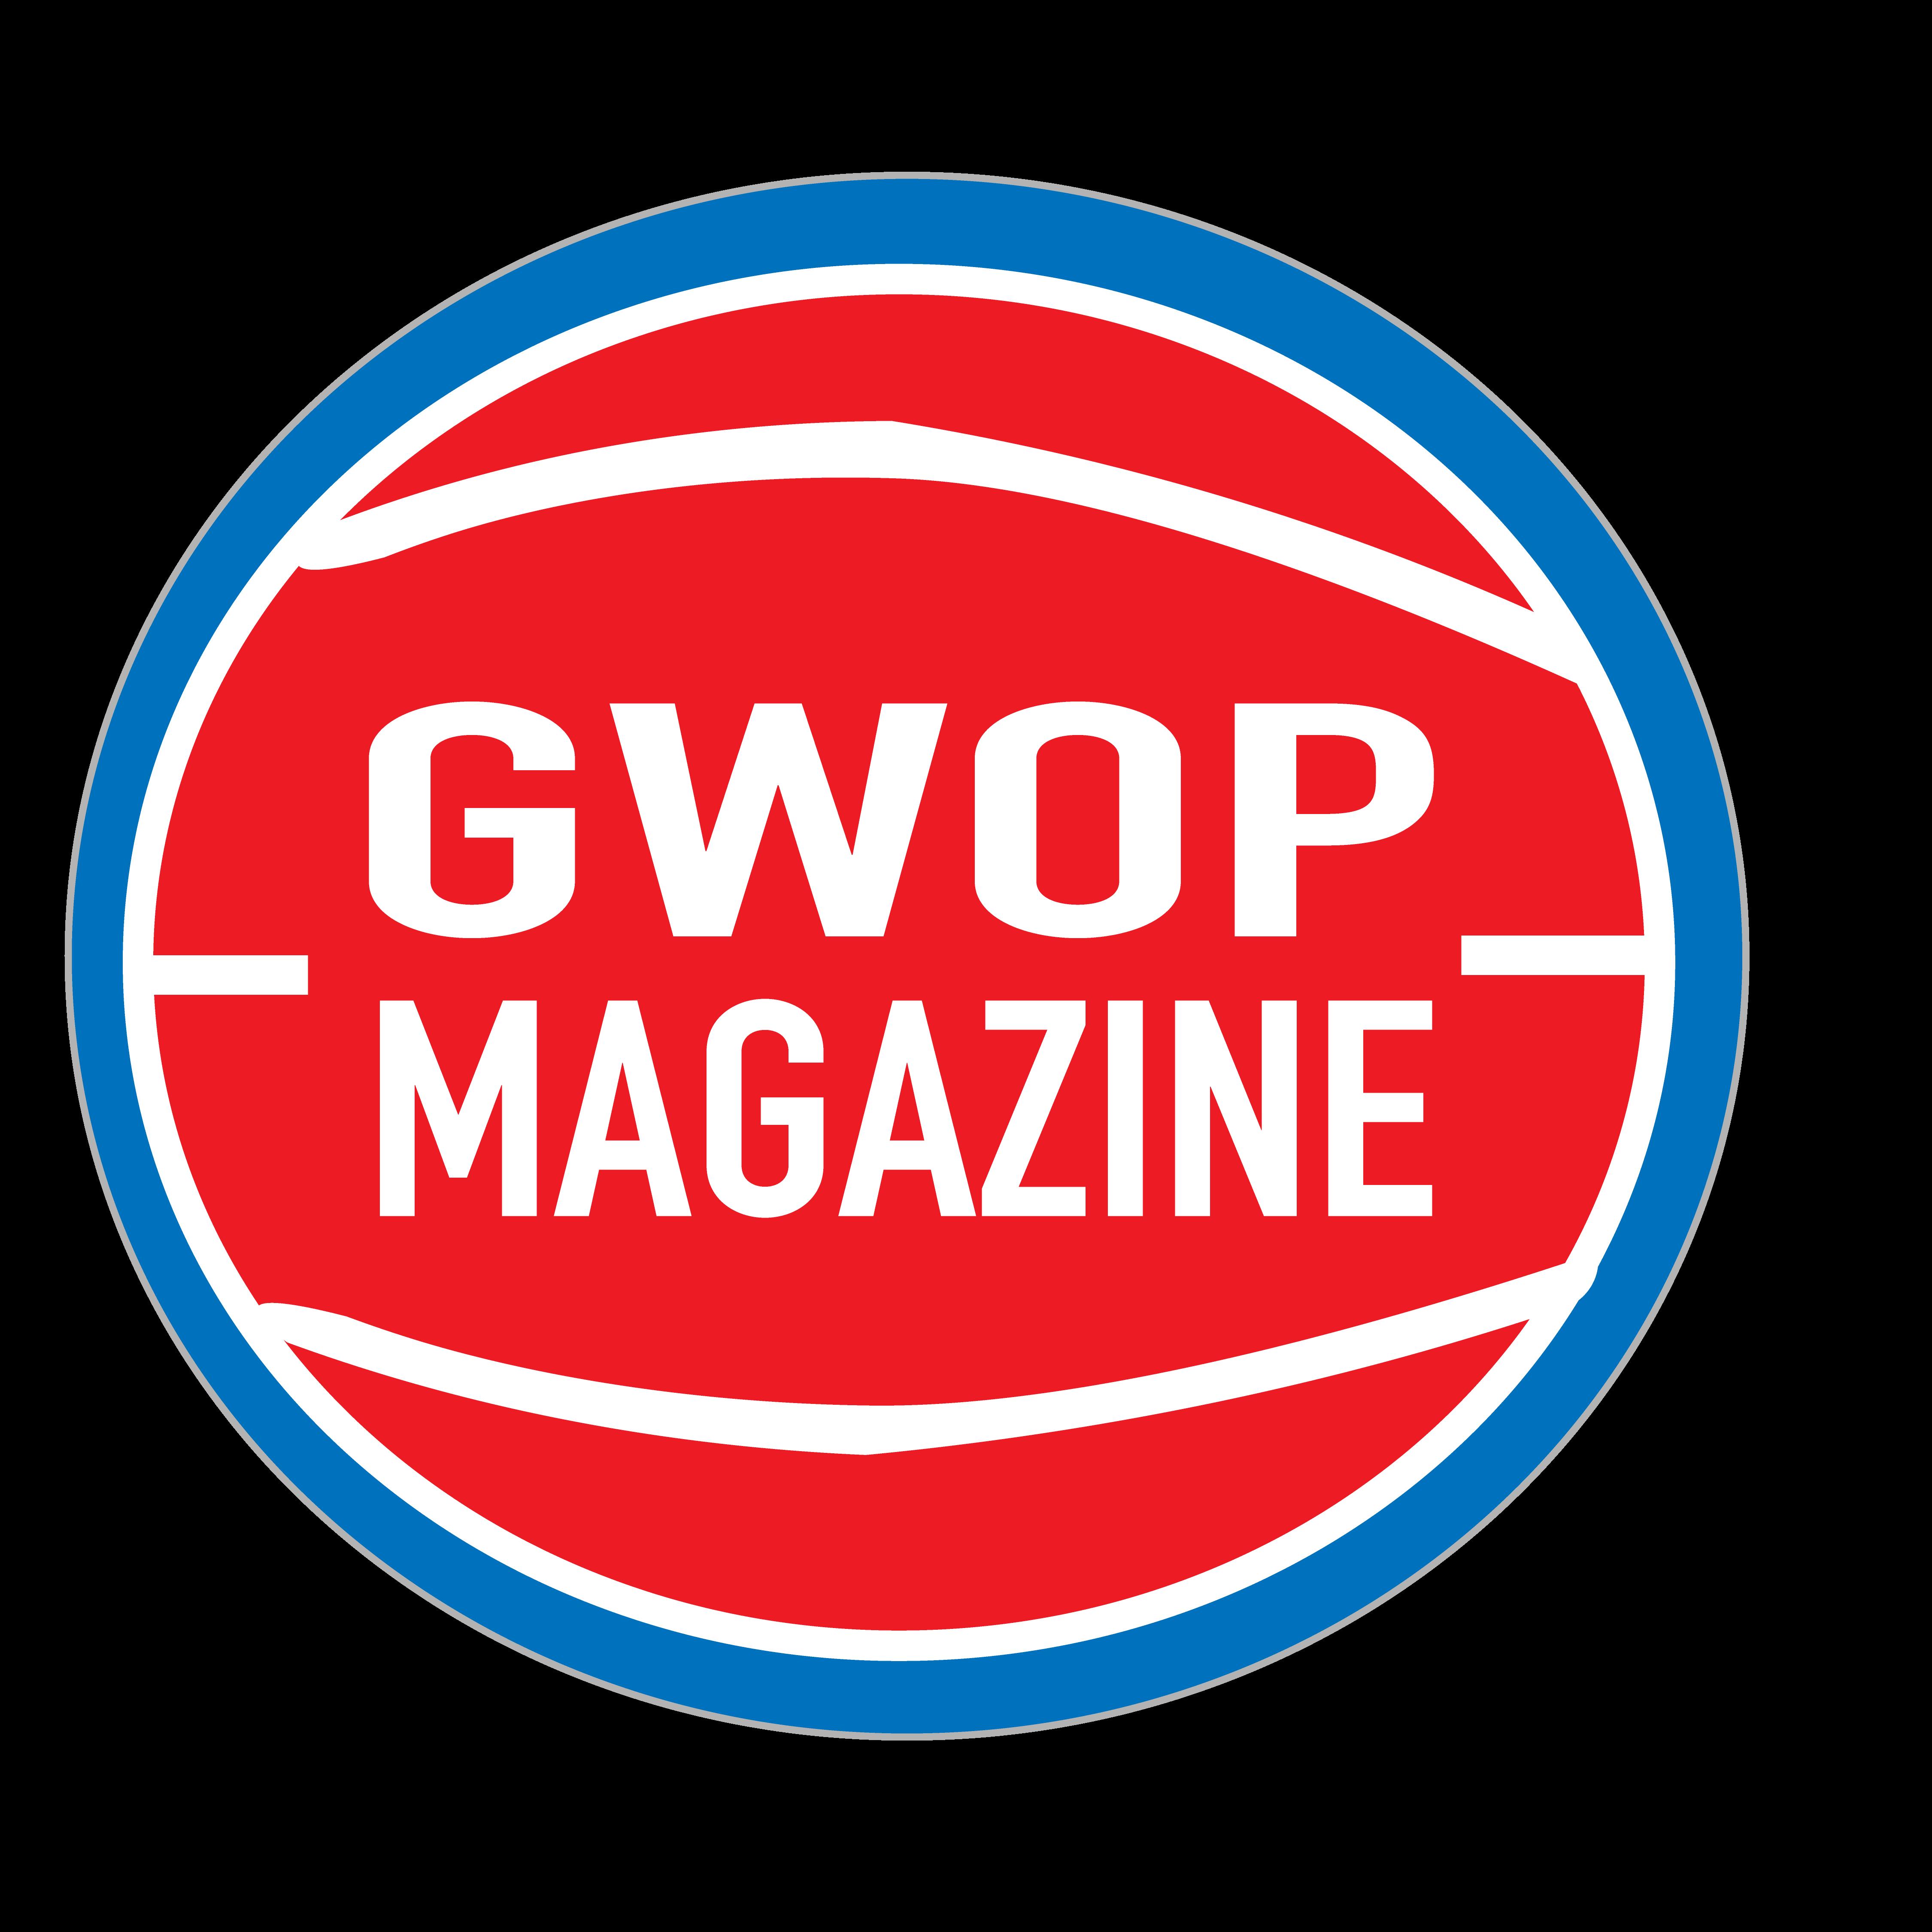 GWOP Univ - Tshirt Ideas [Recovered]-03.png